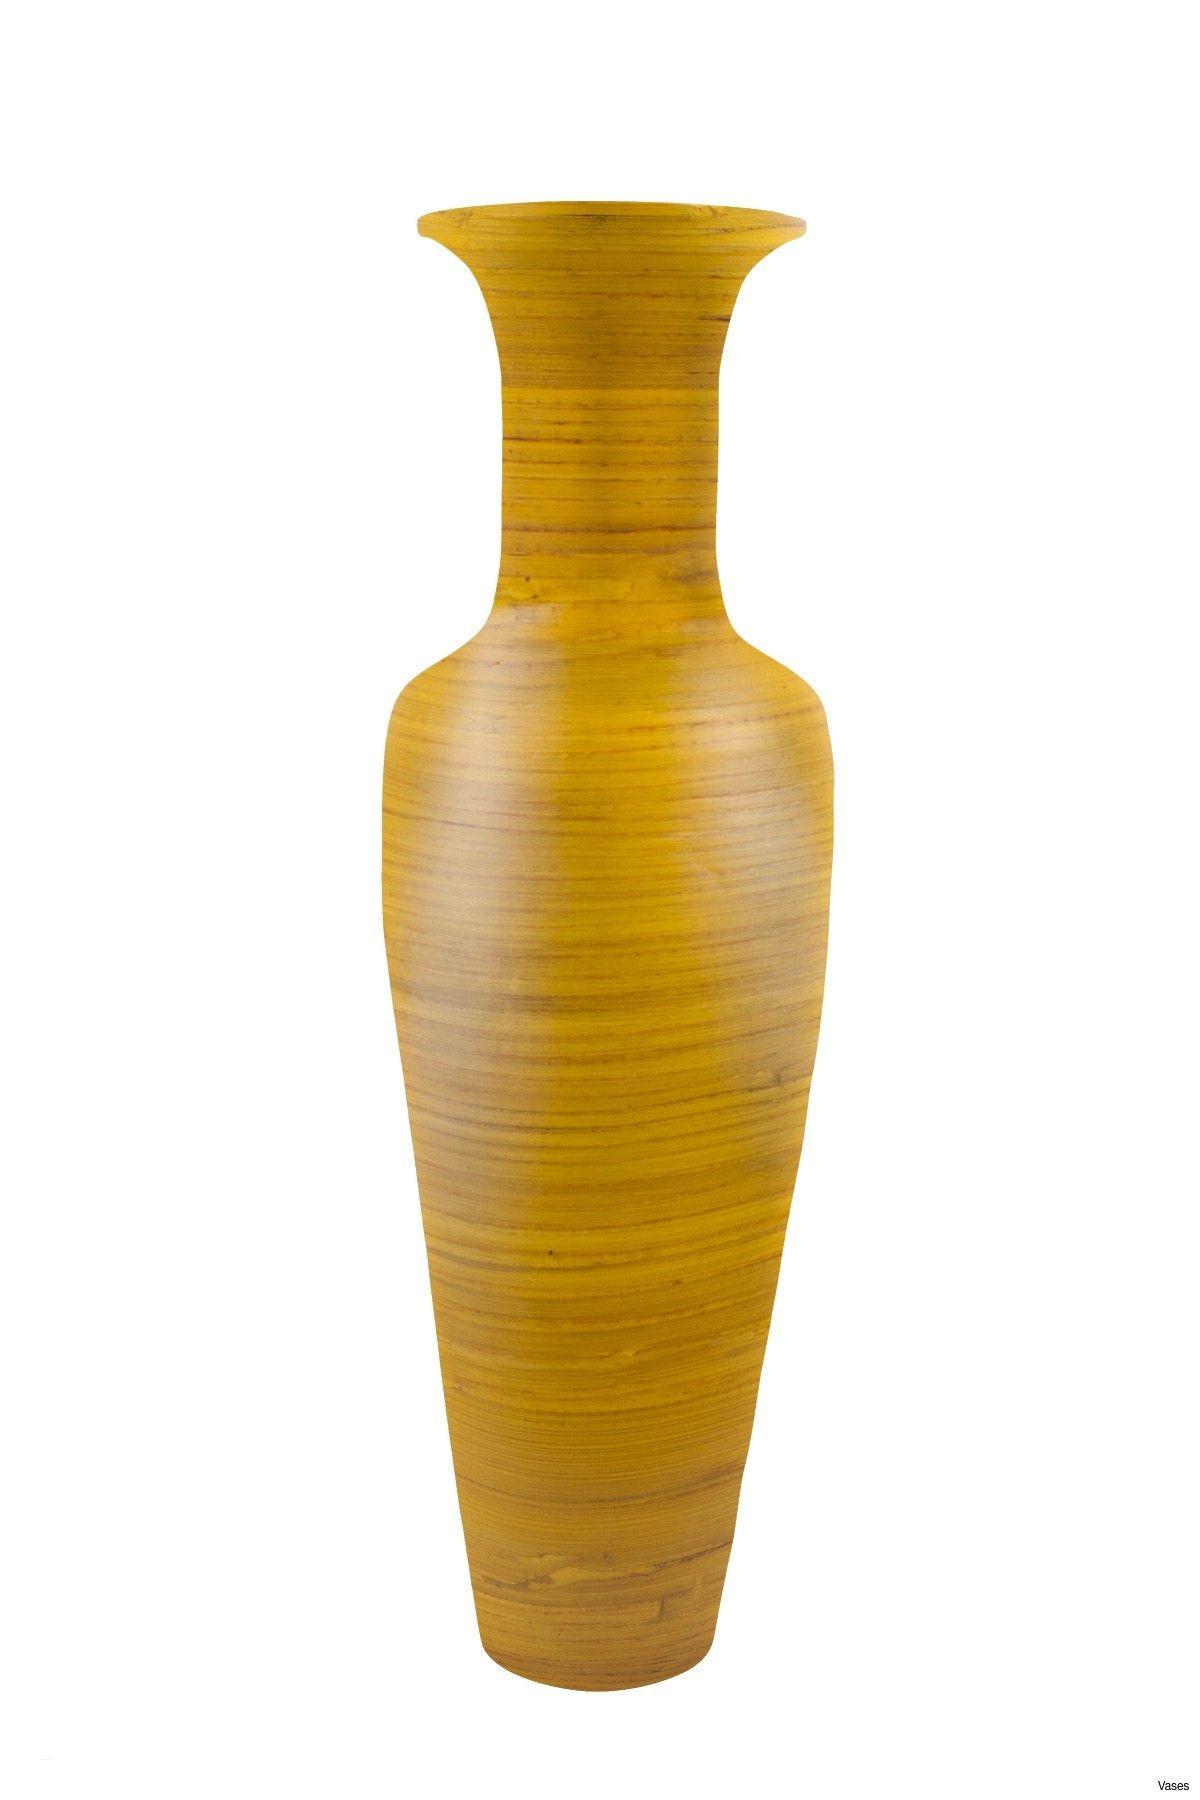 ceramic urns and vases of extra large vase lovely vases for living room unique big vases for with regard to extra large vase lovely vases for living room unique big vases for living room extra